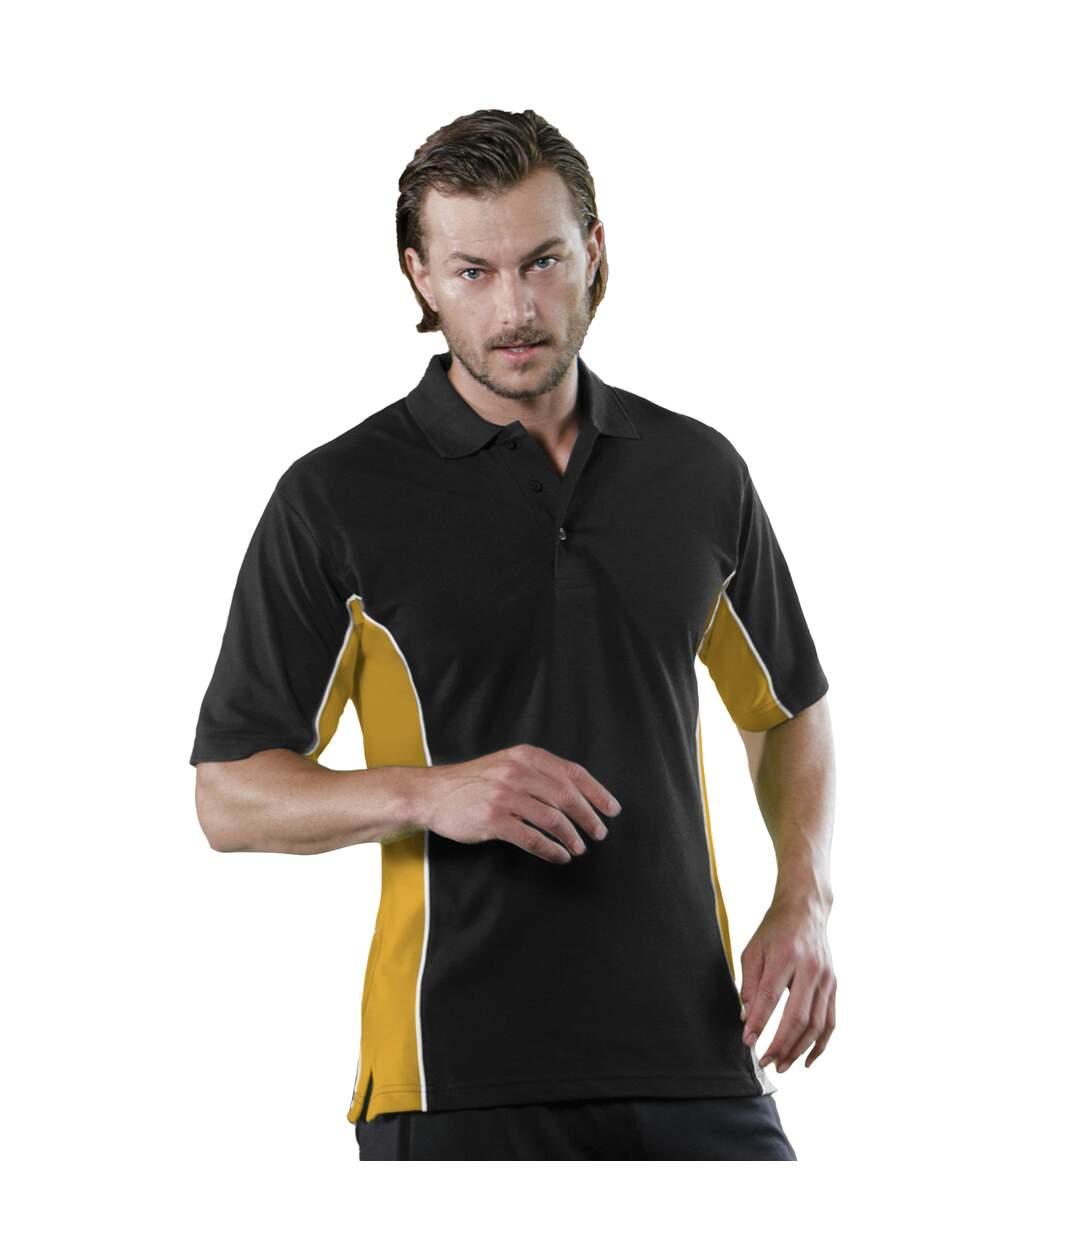 Gamegear® Mens Track Pique Short Sleeve Polo Shirt Top (Navy/ Turqoise) - UTBC412